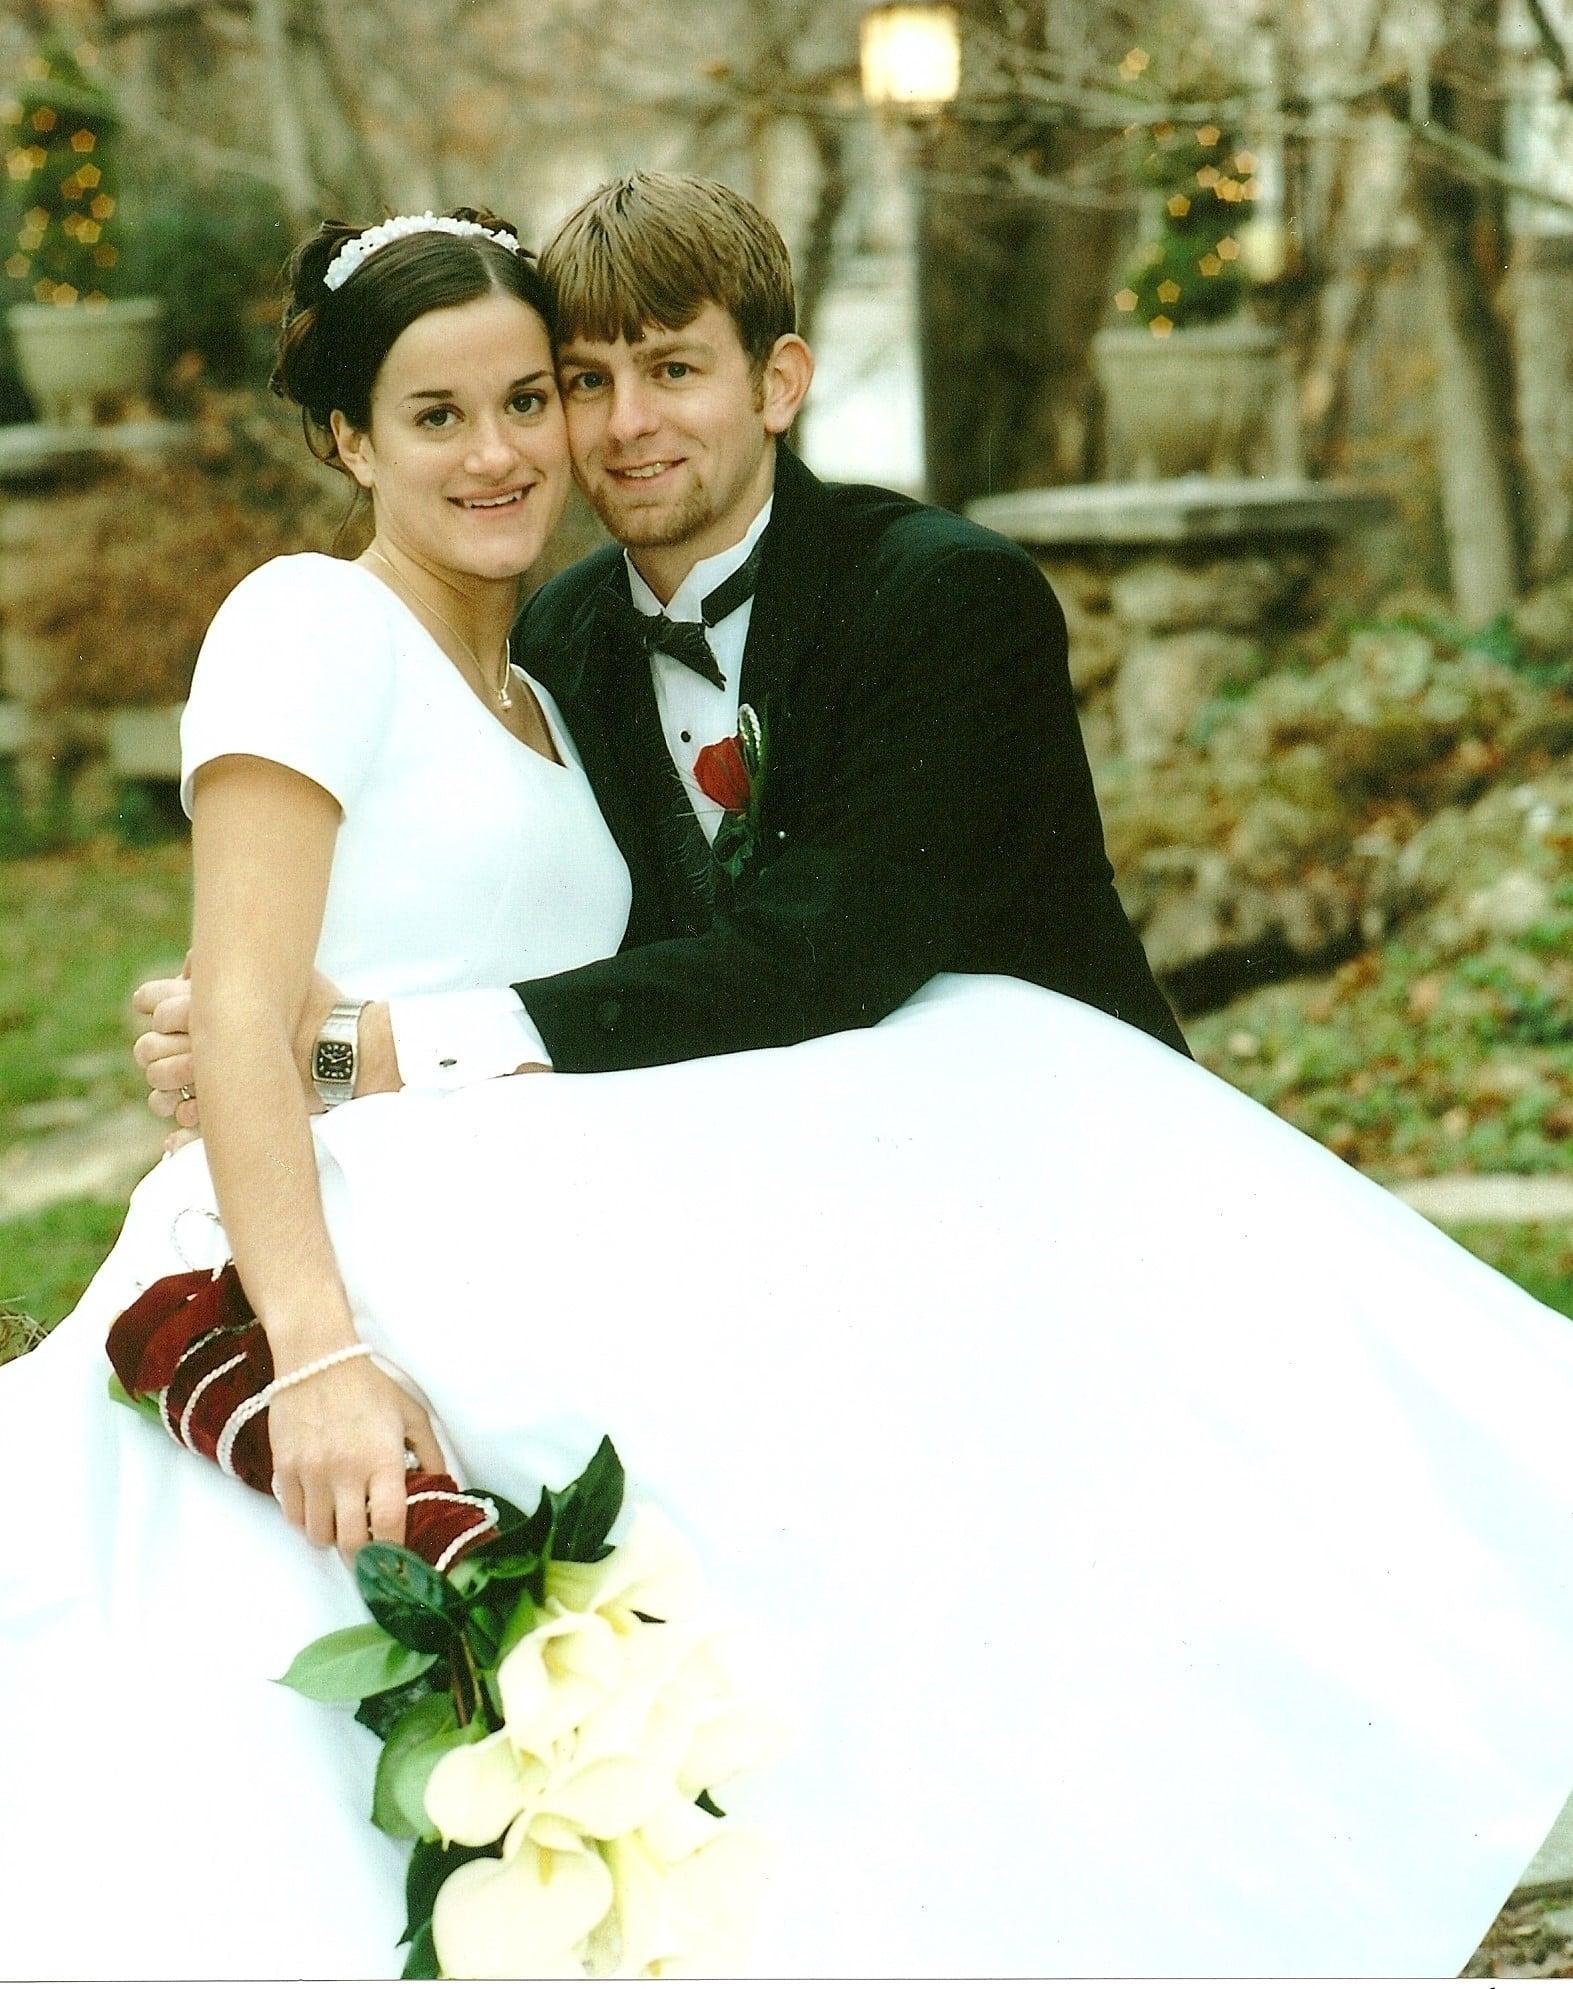 tmp_JHVOLN_359311e0d31772b9_Copy_of_Michael-Katy_wed_day_3_.jpg